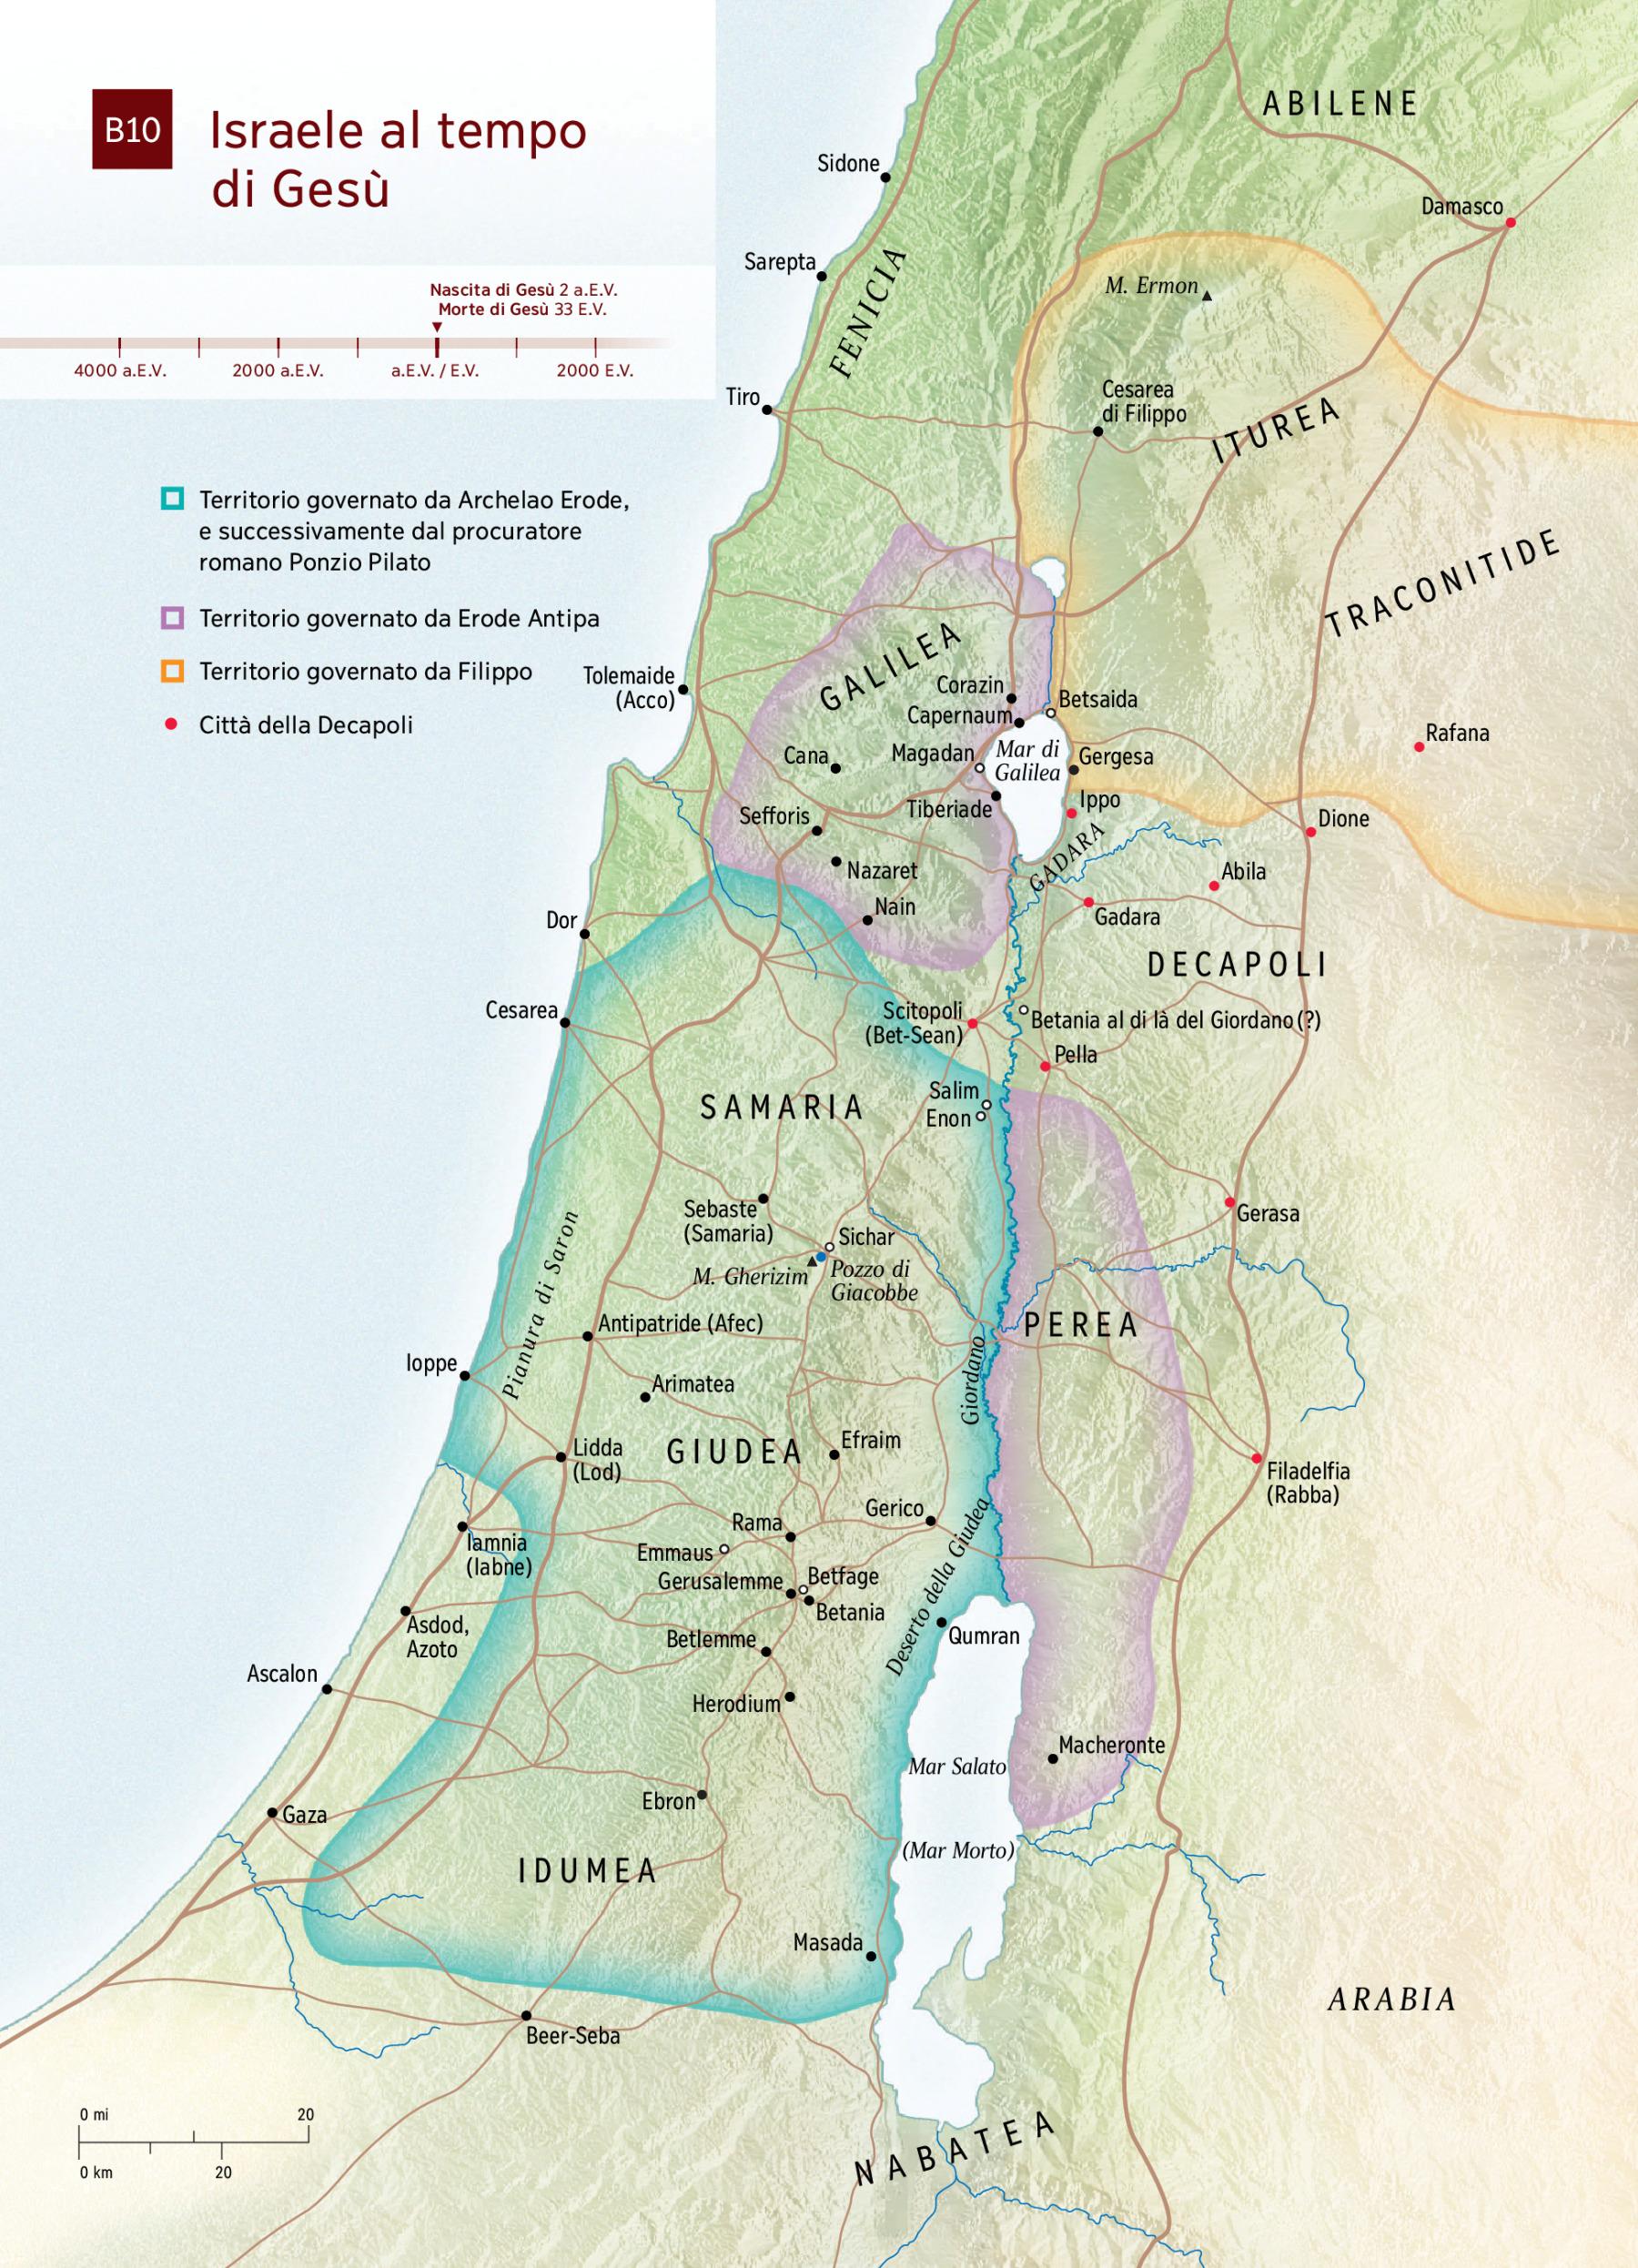 Cartina Israele.Cartina Israele Al Tempo Di Gesu Tnm